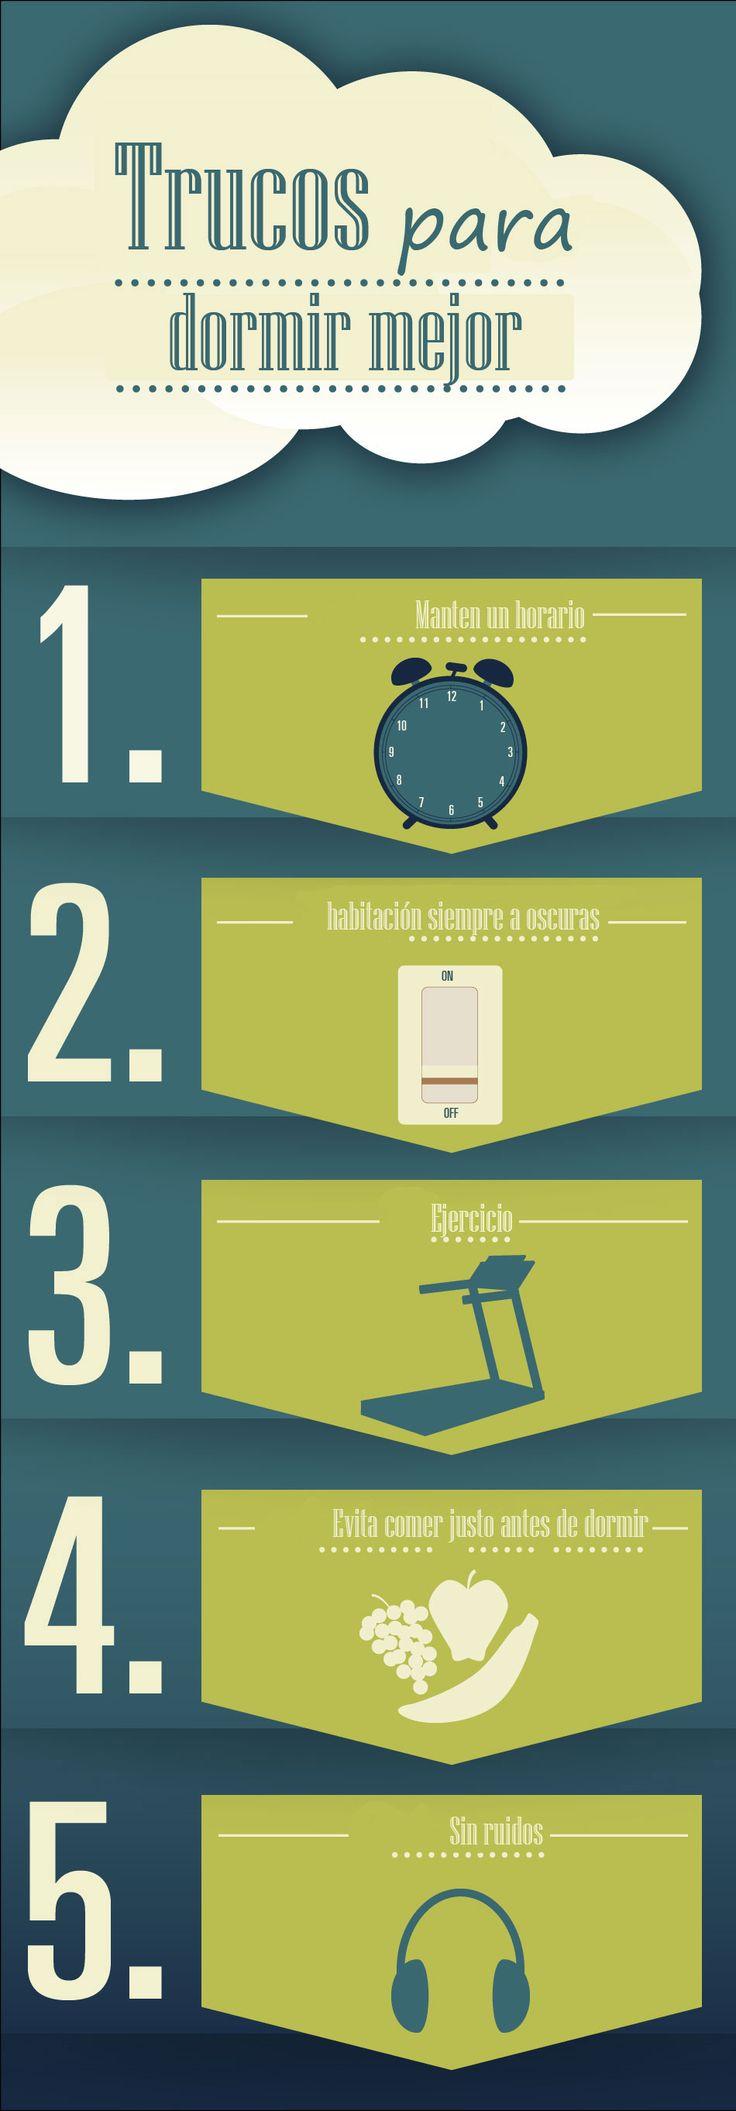 5 Trucos para dormir mejor - Blog del descanso de Colchón Exprés